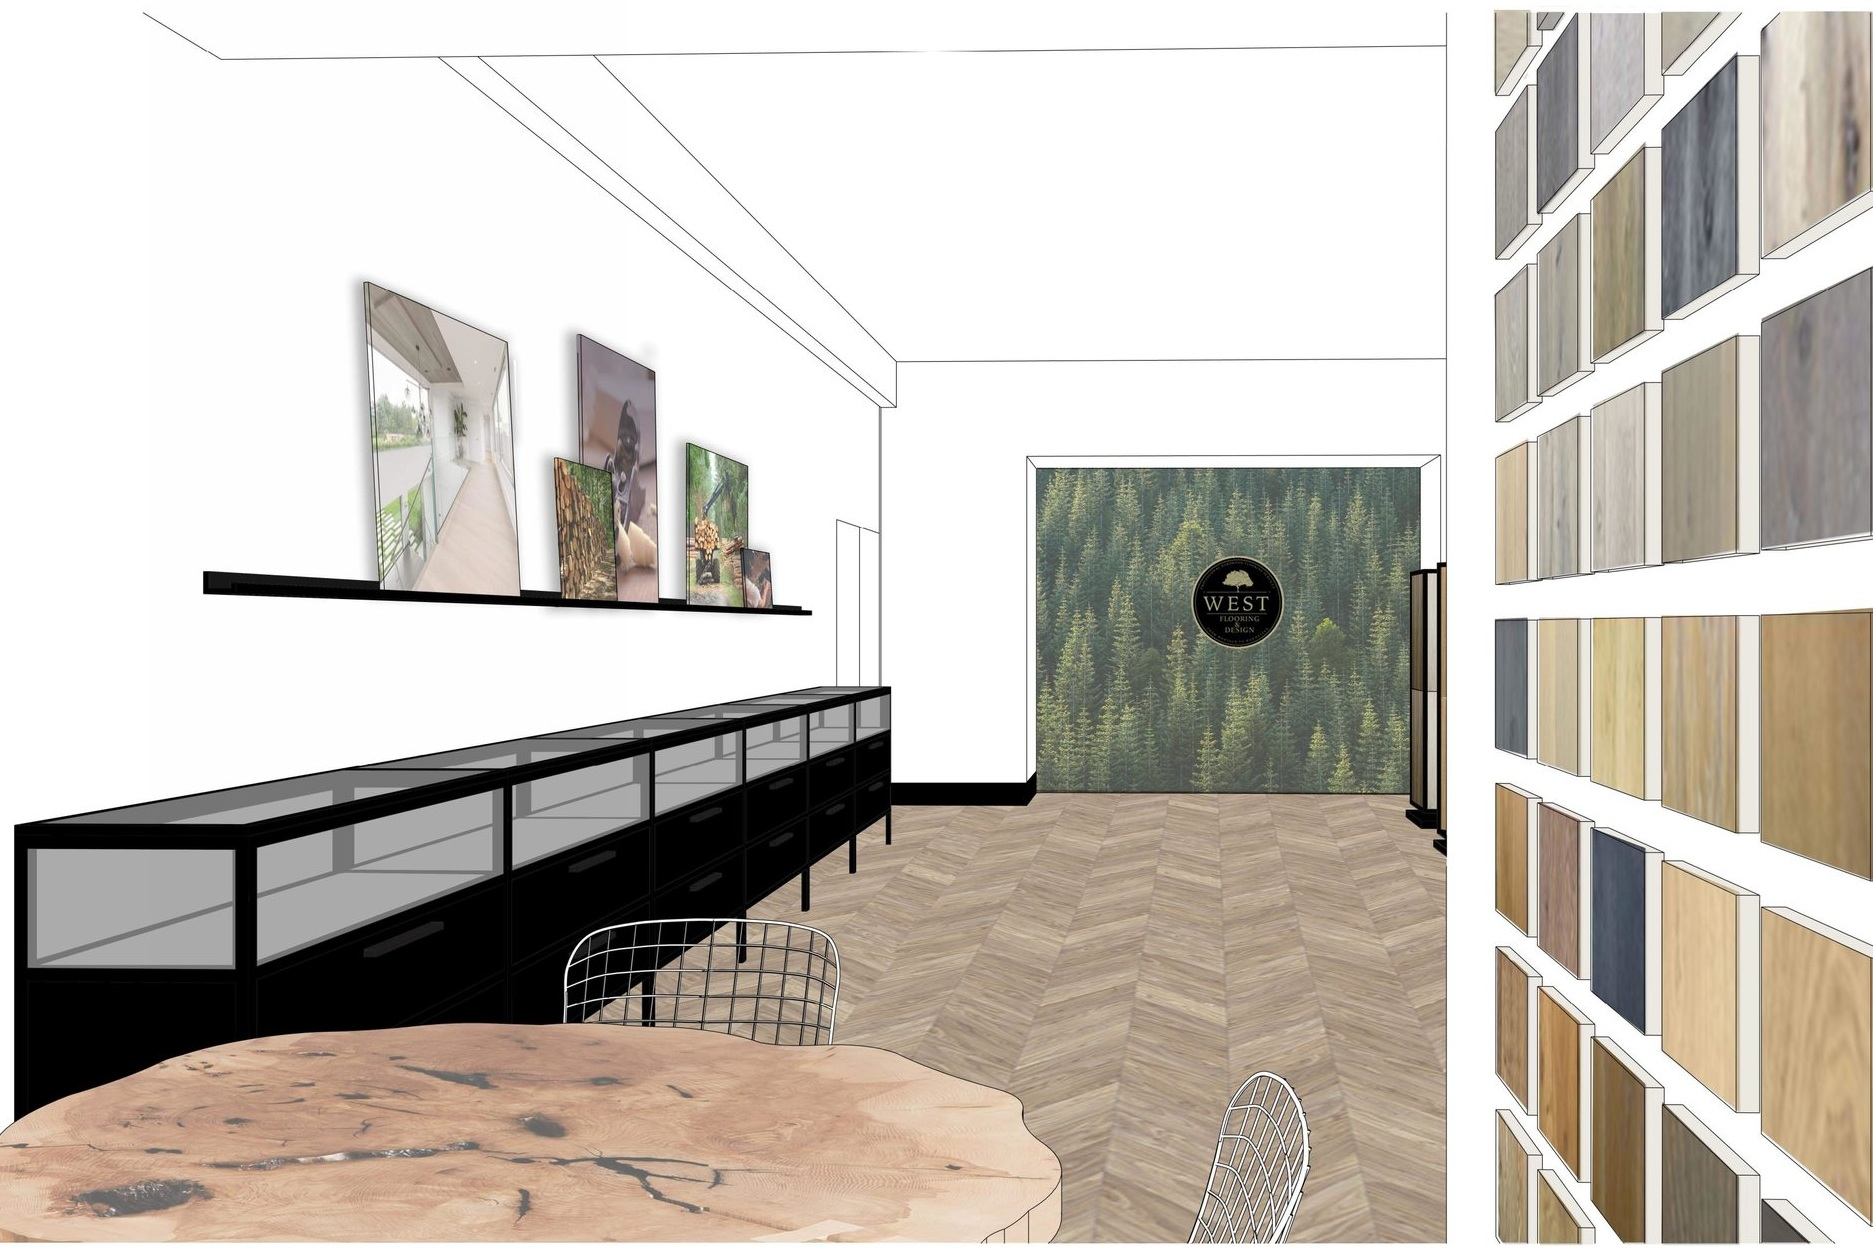 Design - Interior Design Firm - New York - Tobin Parnes Design